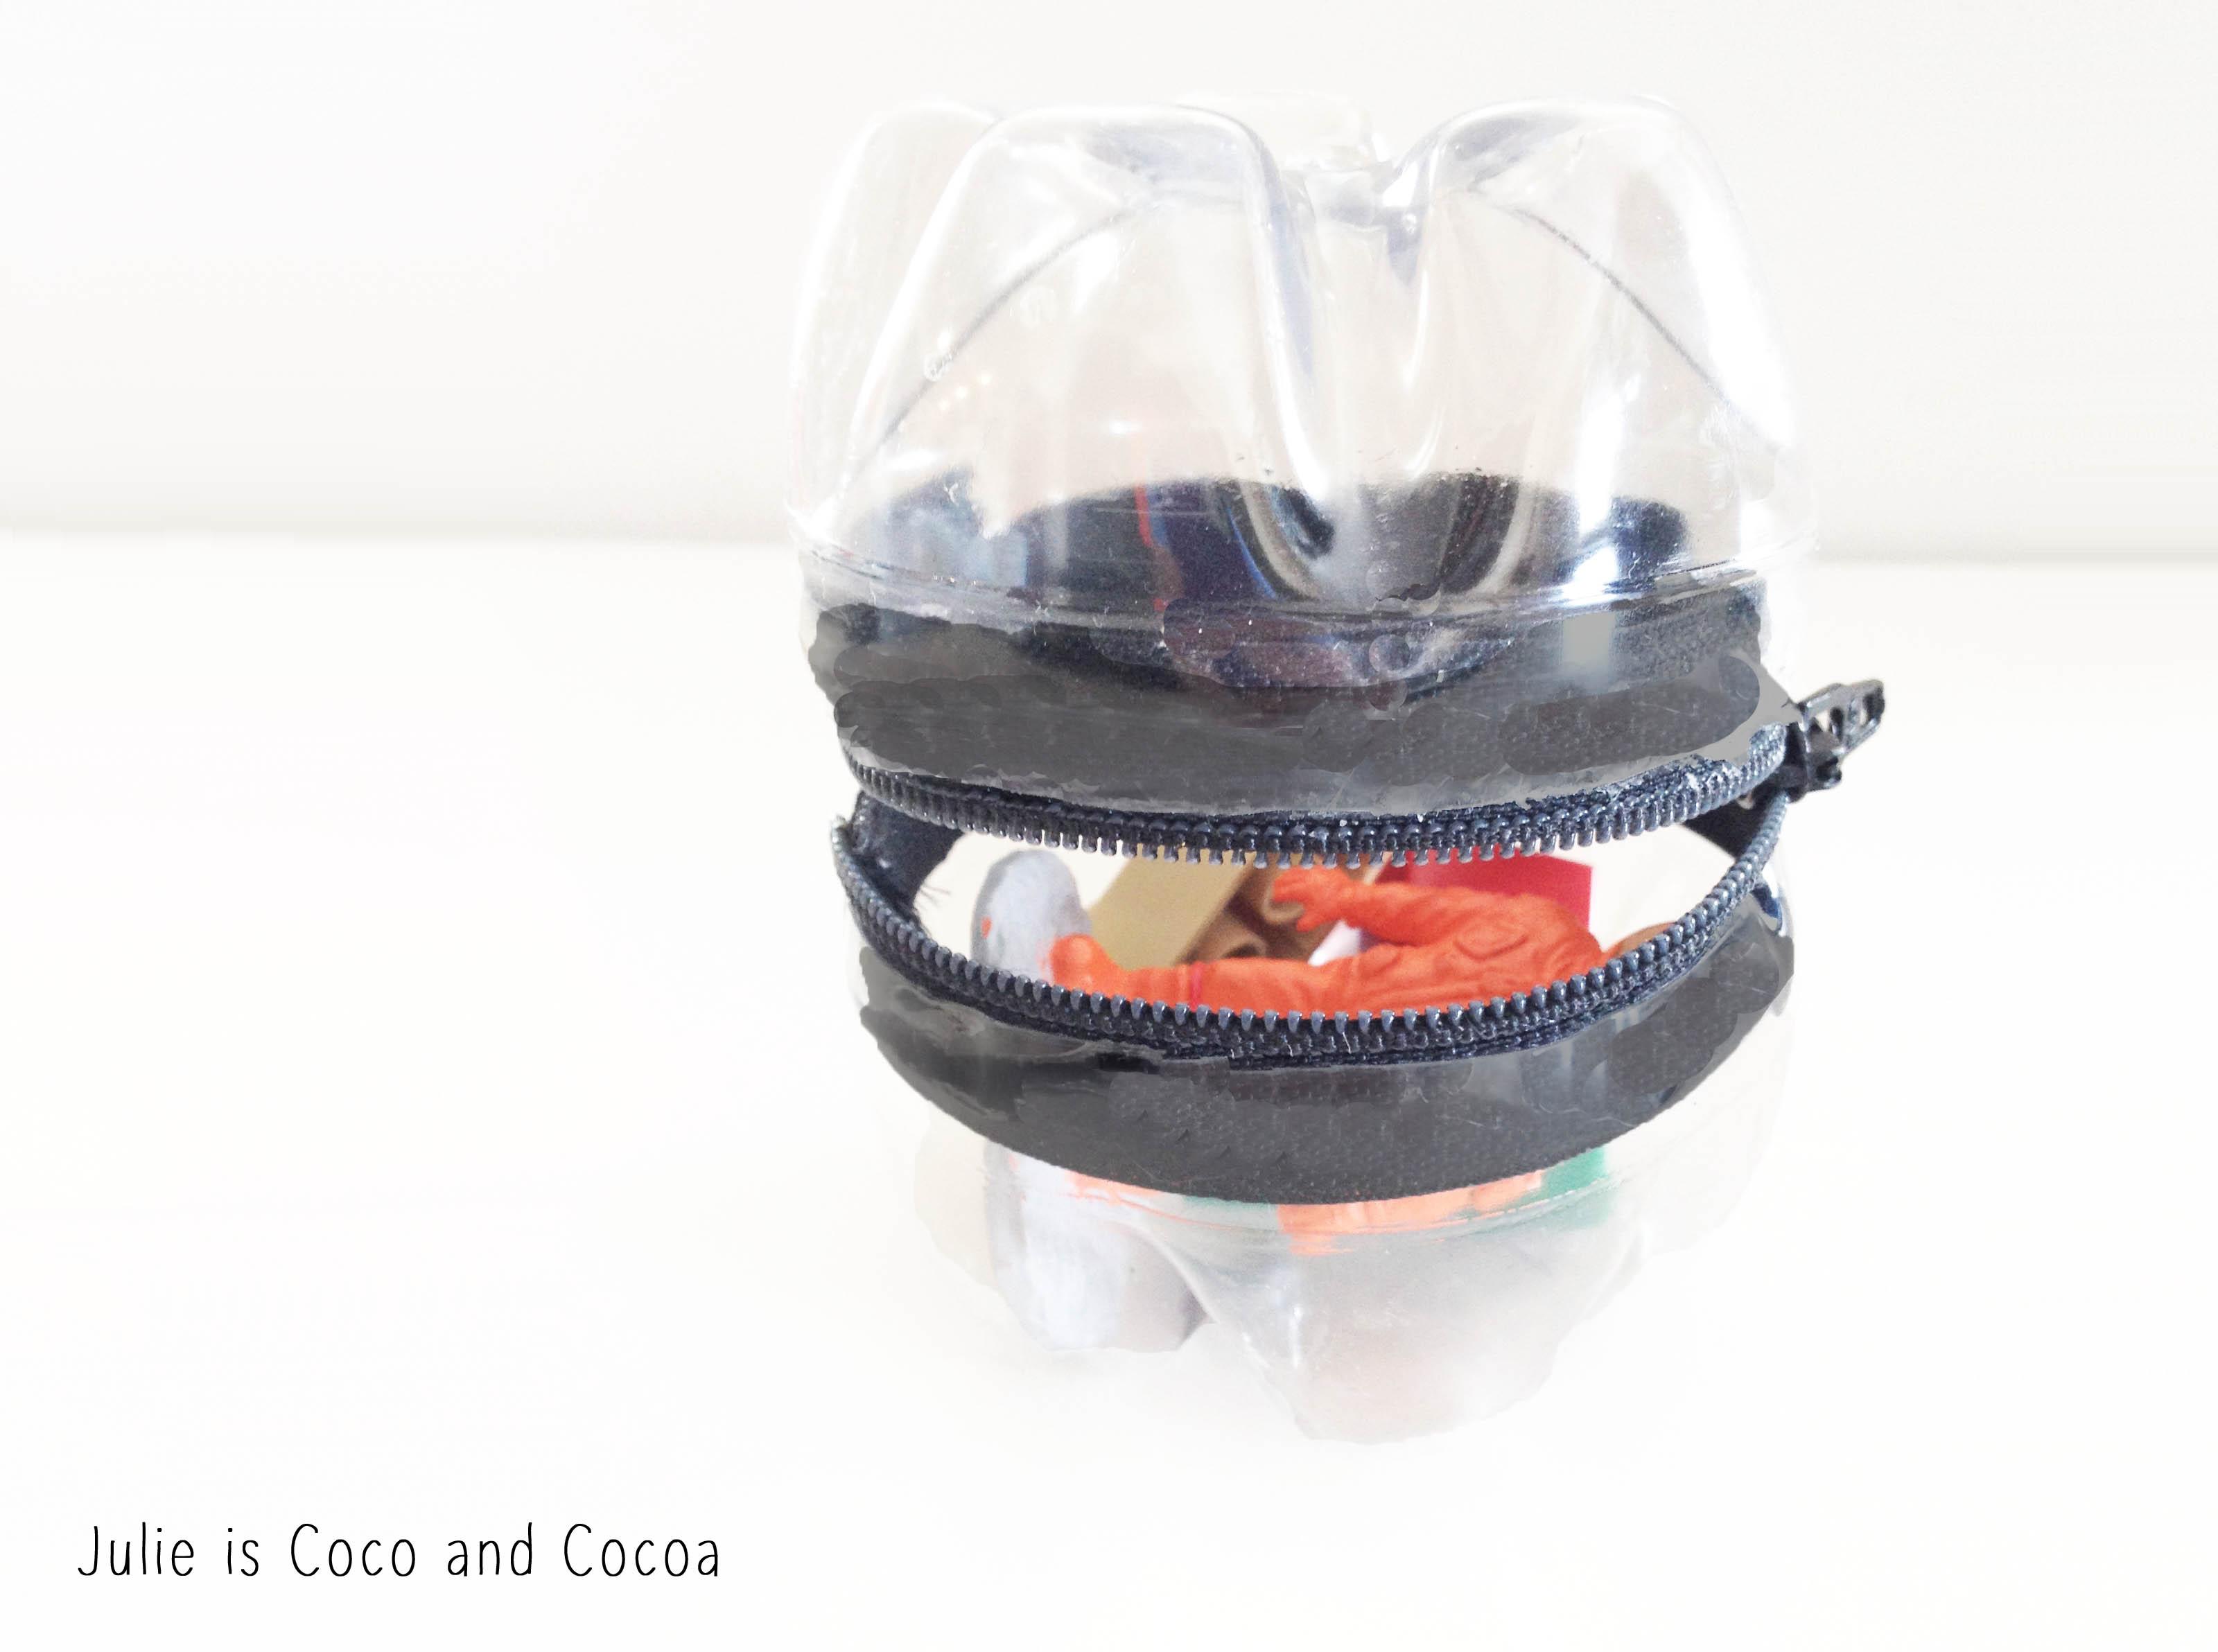 zipper plastic bottle container